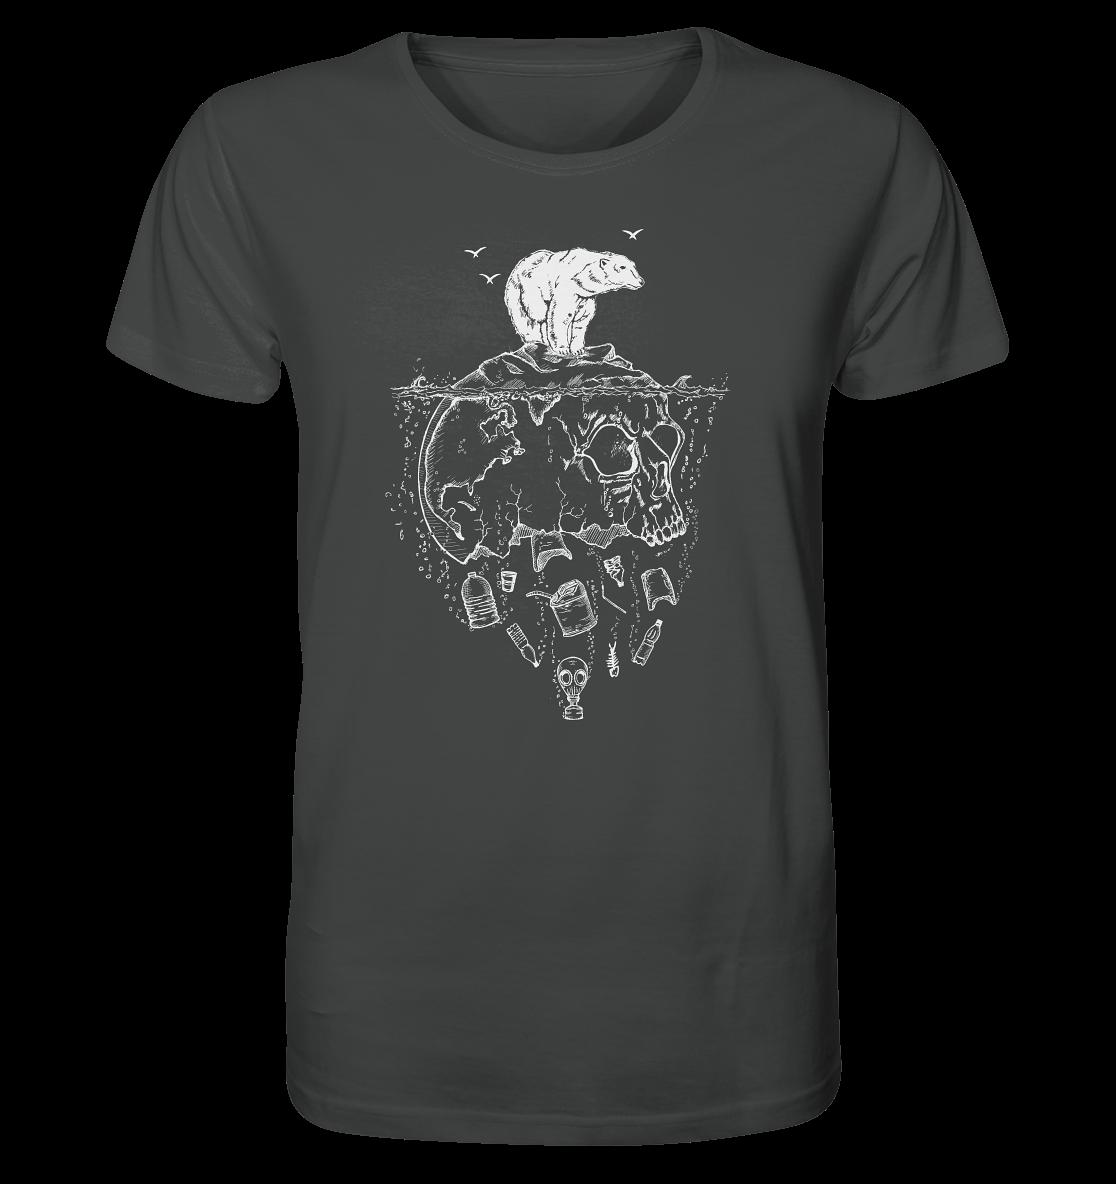 front-organic-shirt-444545-1116x-5.png